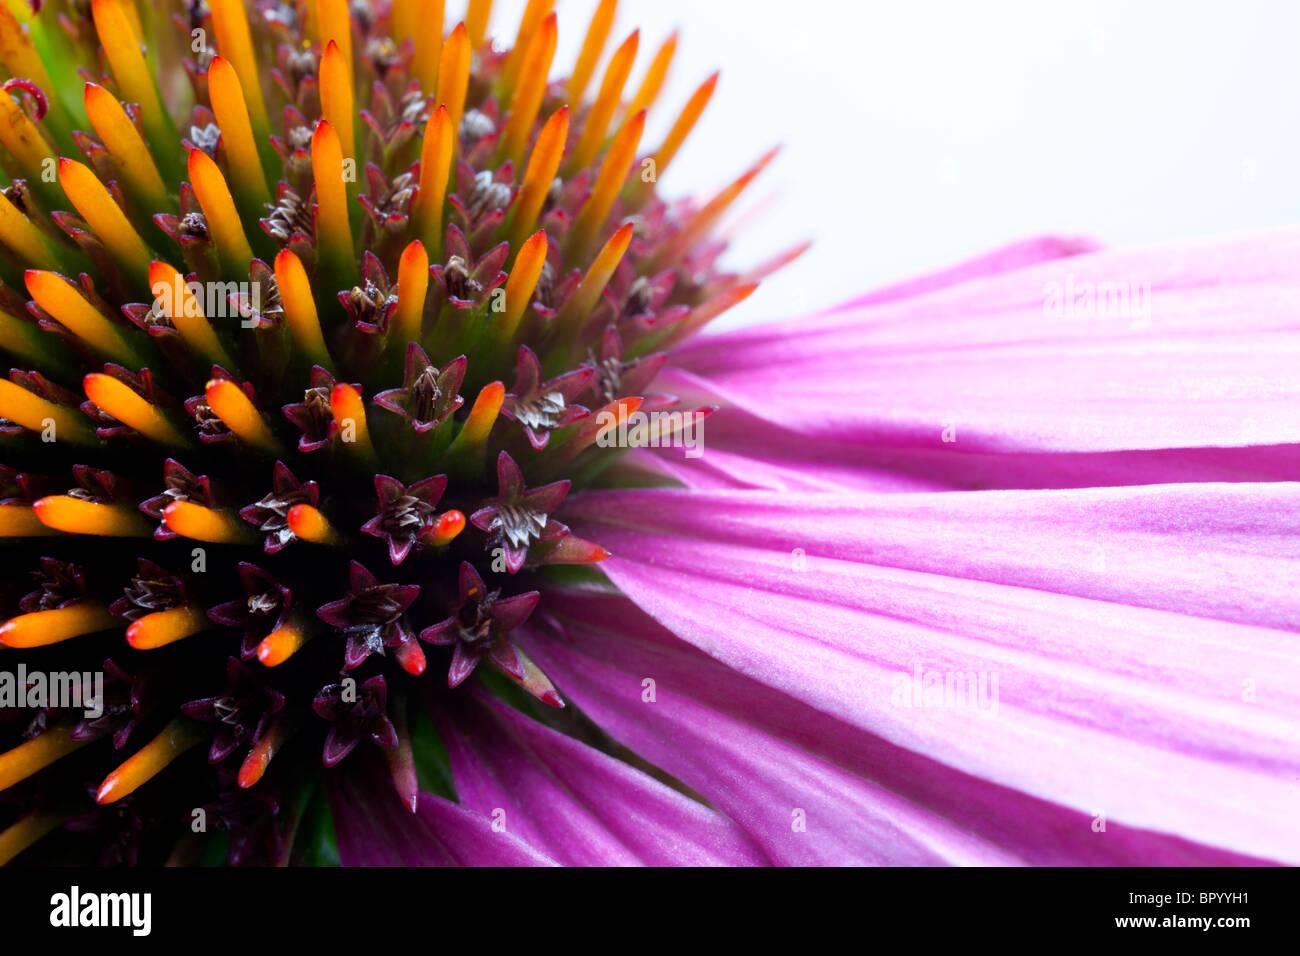 Echinacea Photo Stock